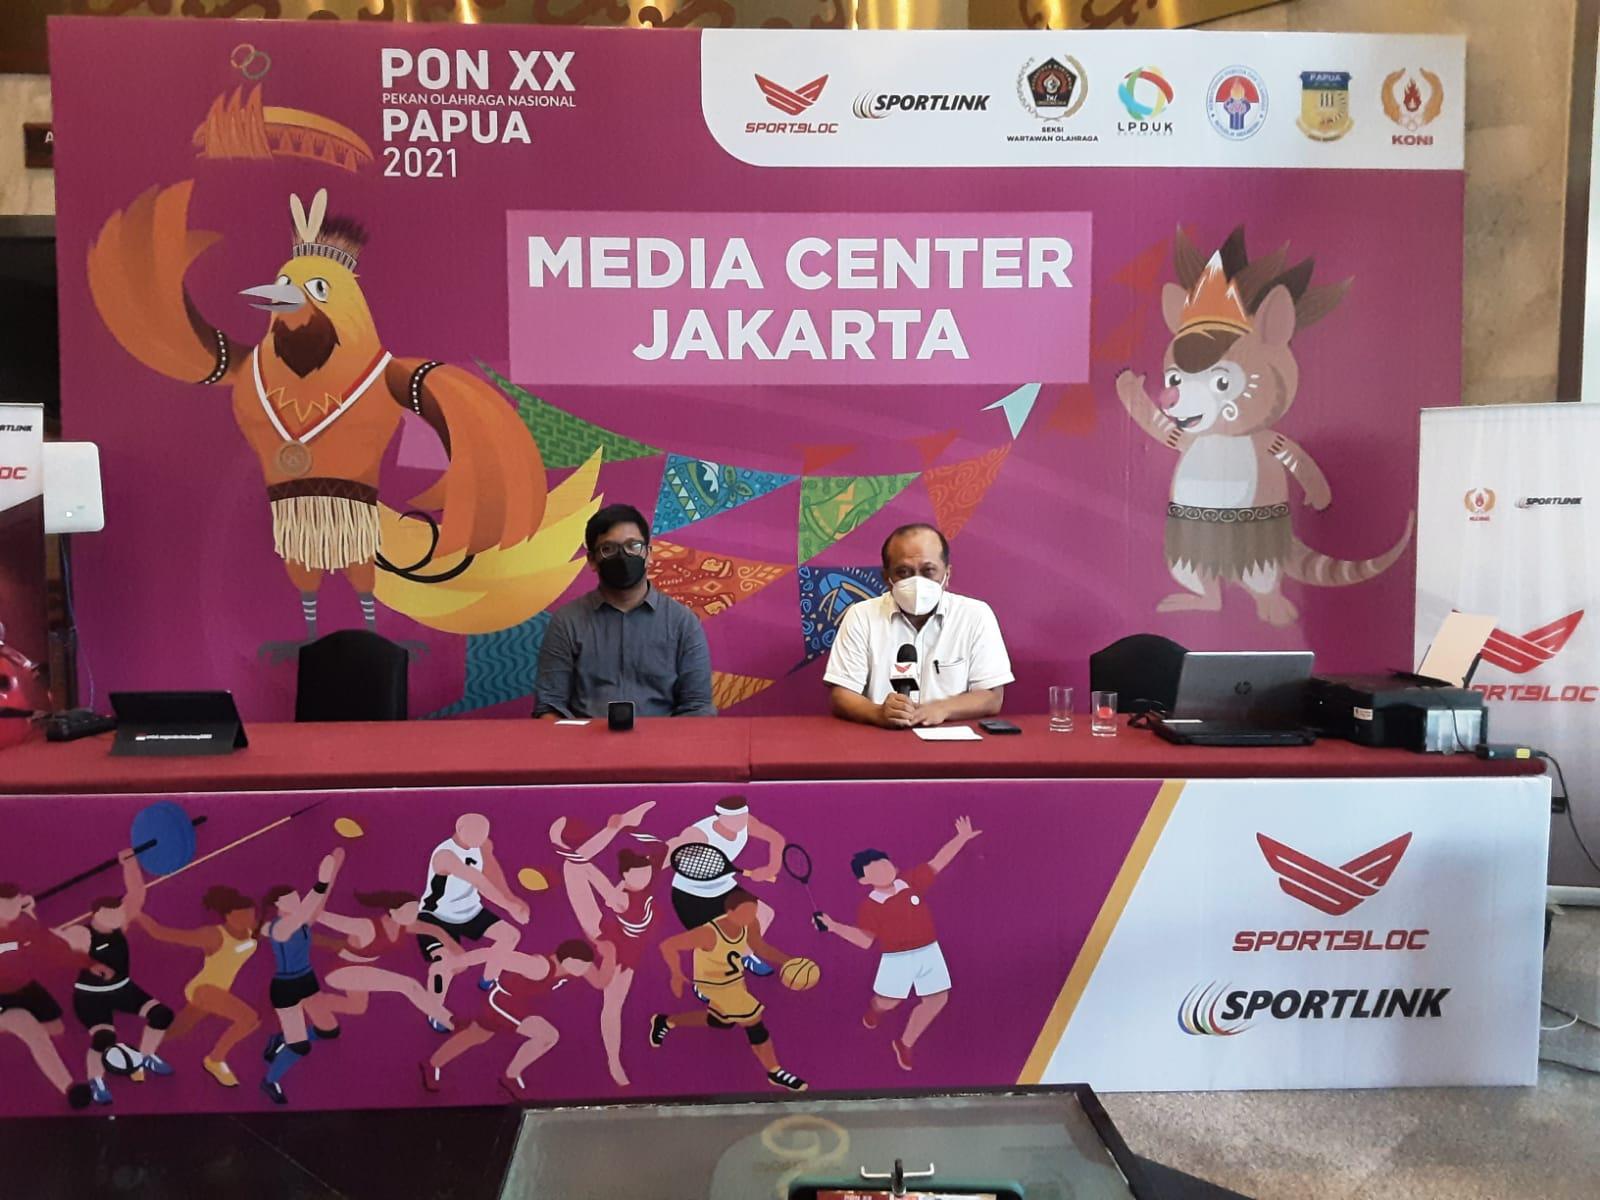 Equinoc Bergabung Dalam Mendukung PON XX Papua 2021